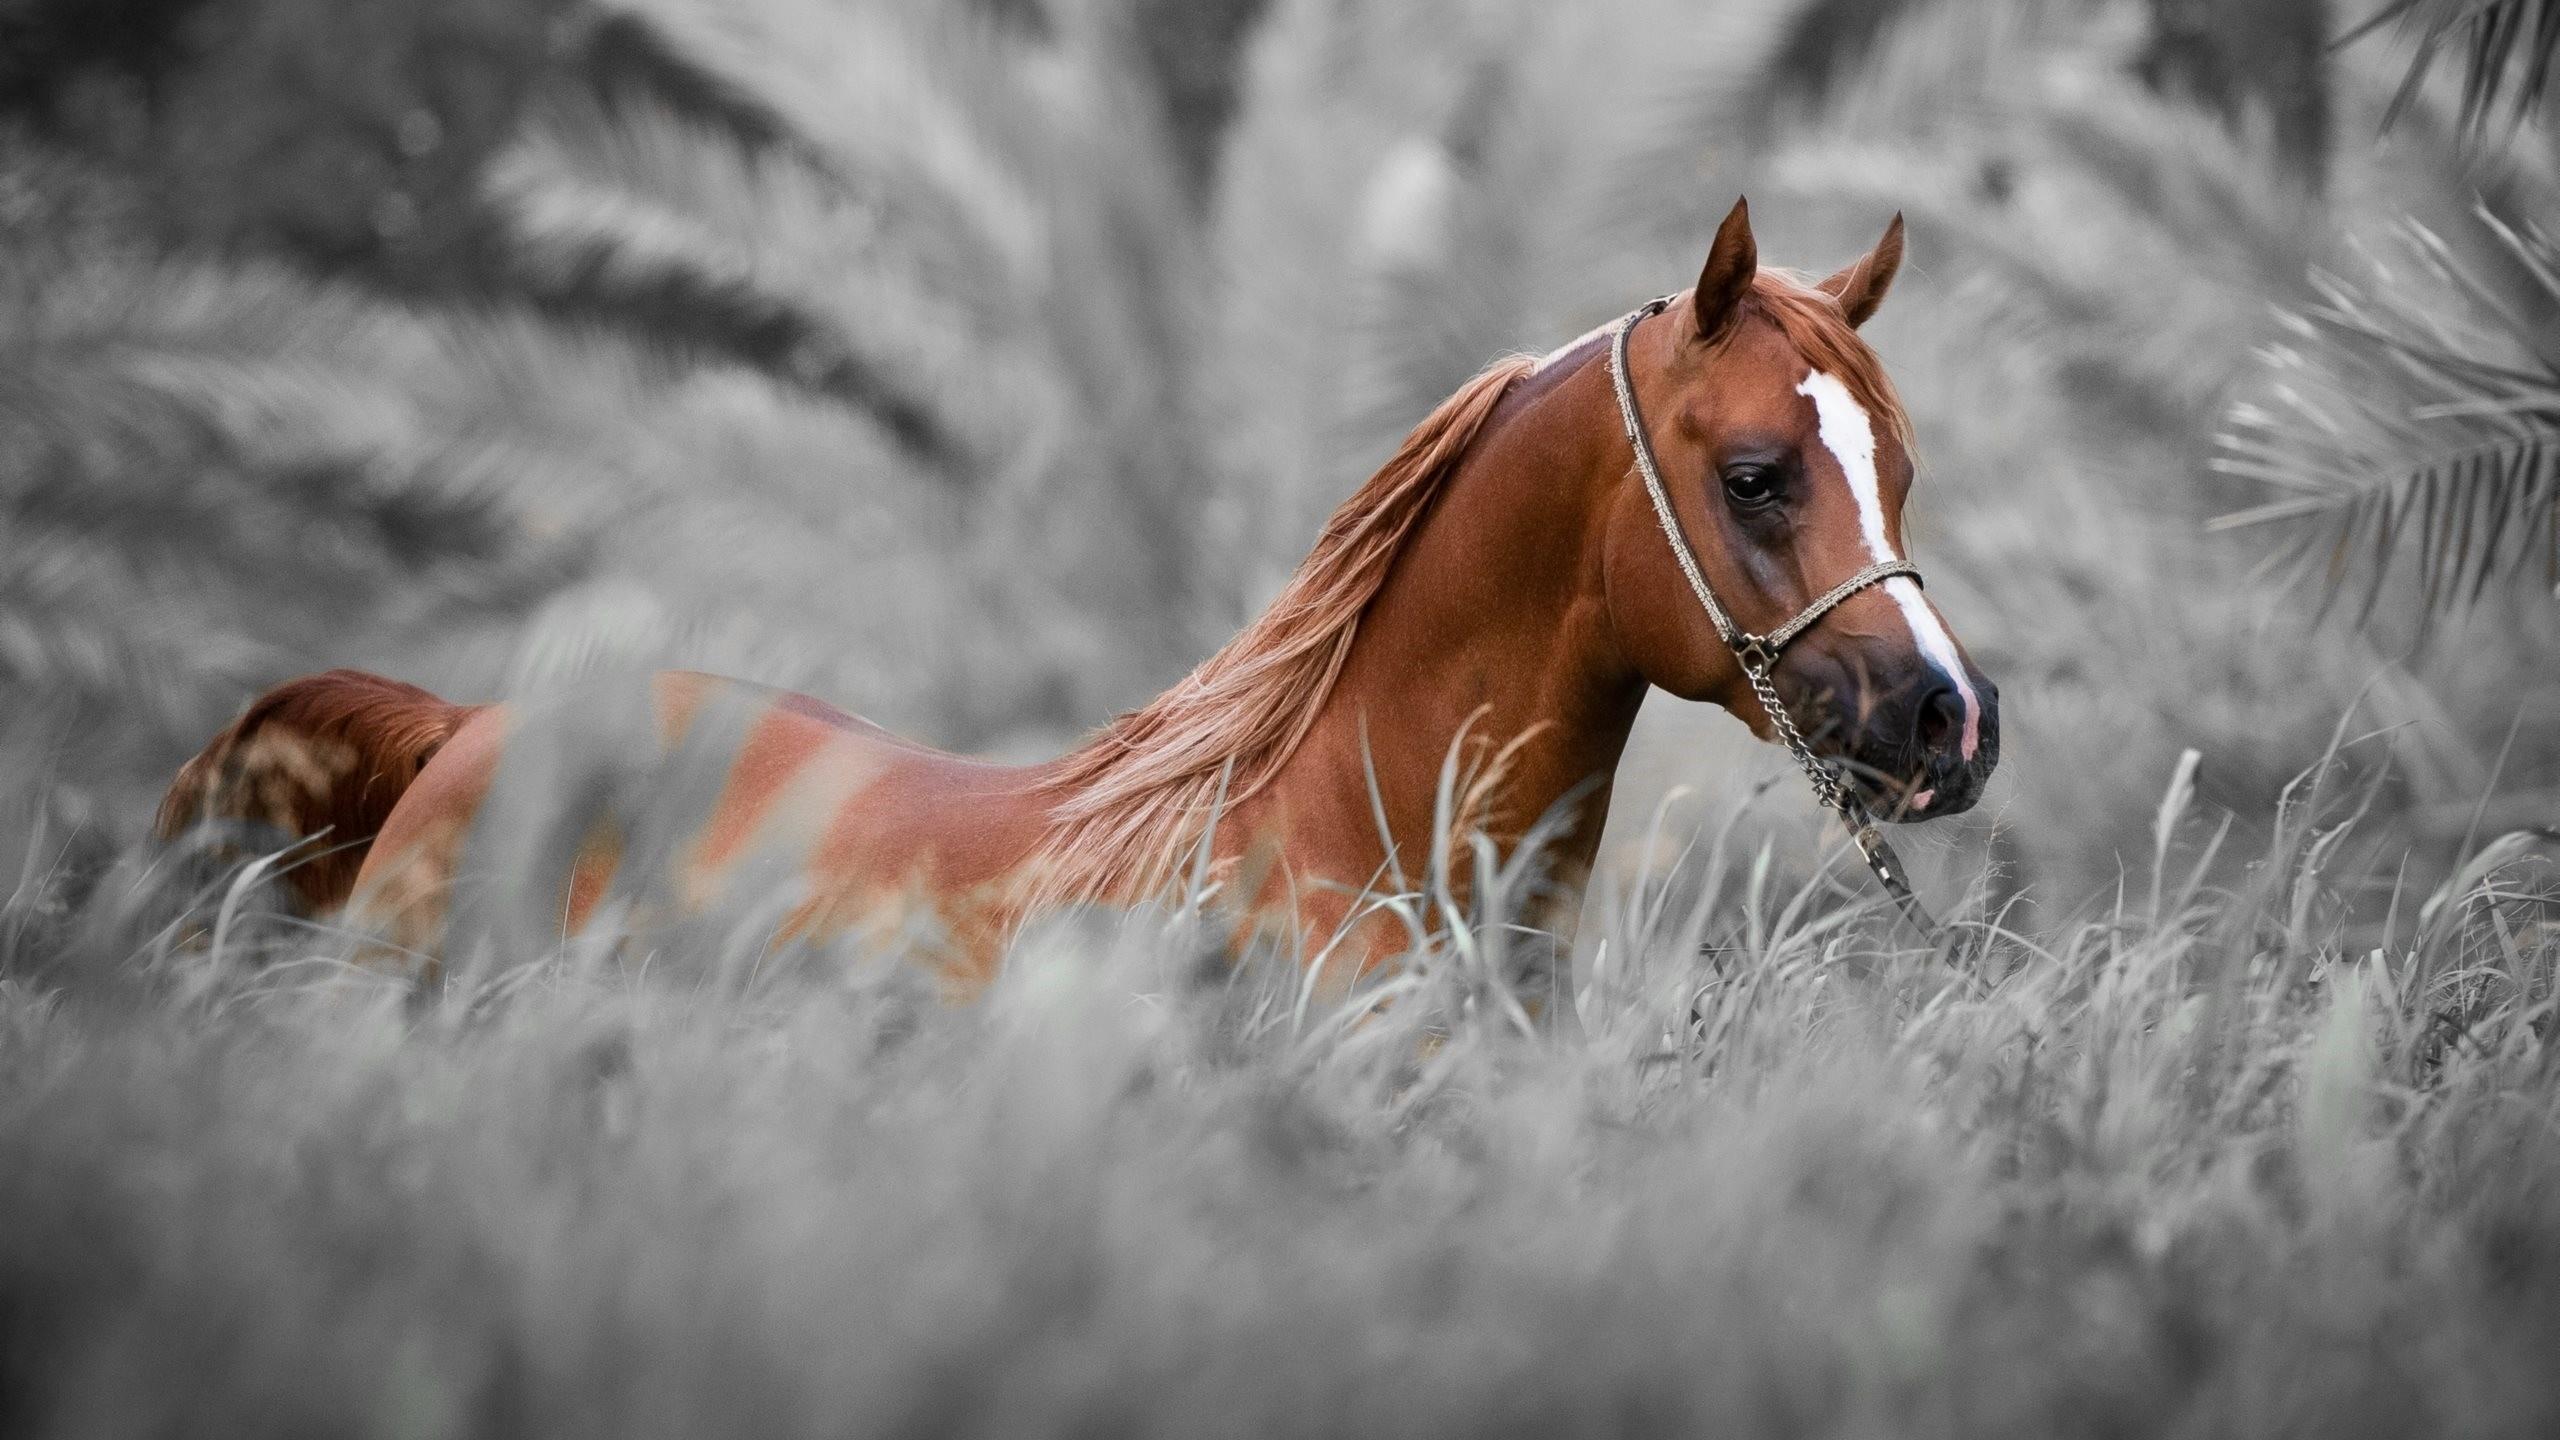 horse wallpaper hd | horse wallpapers hd